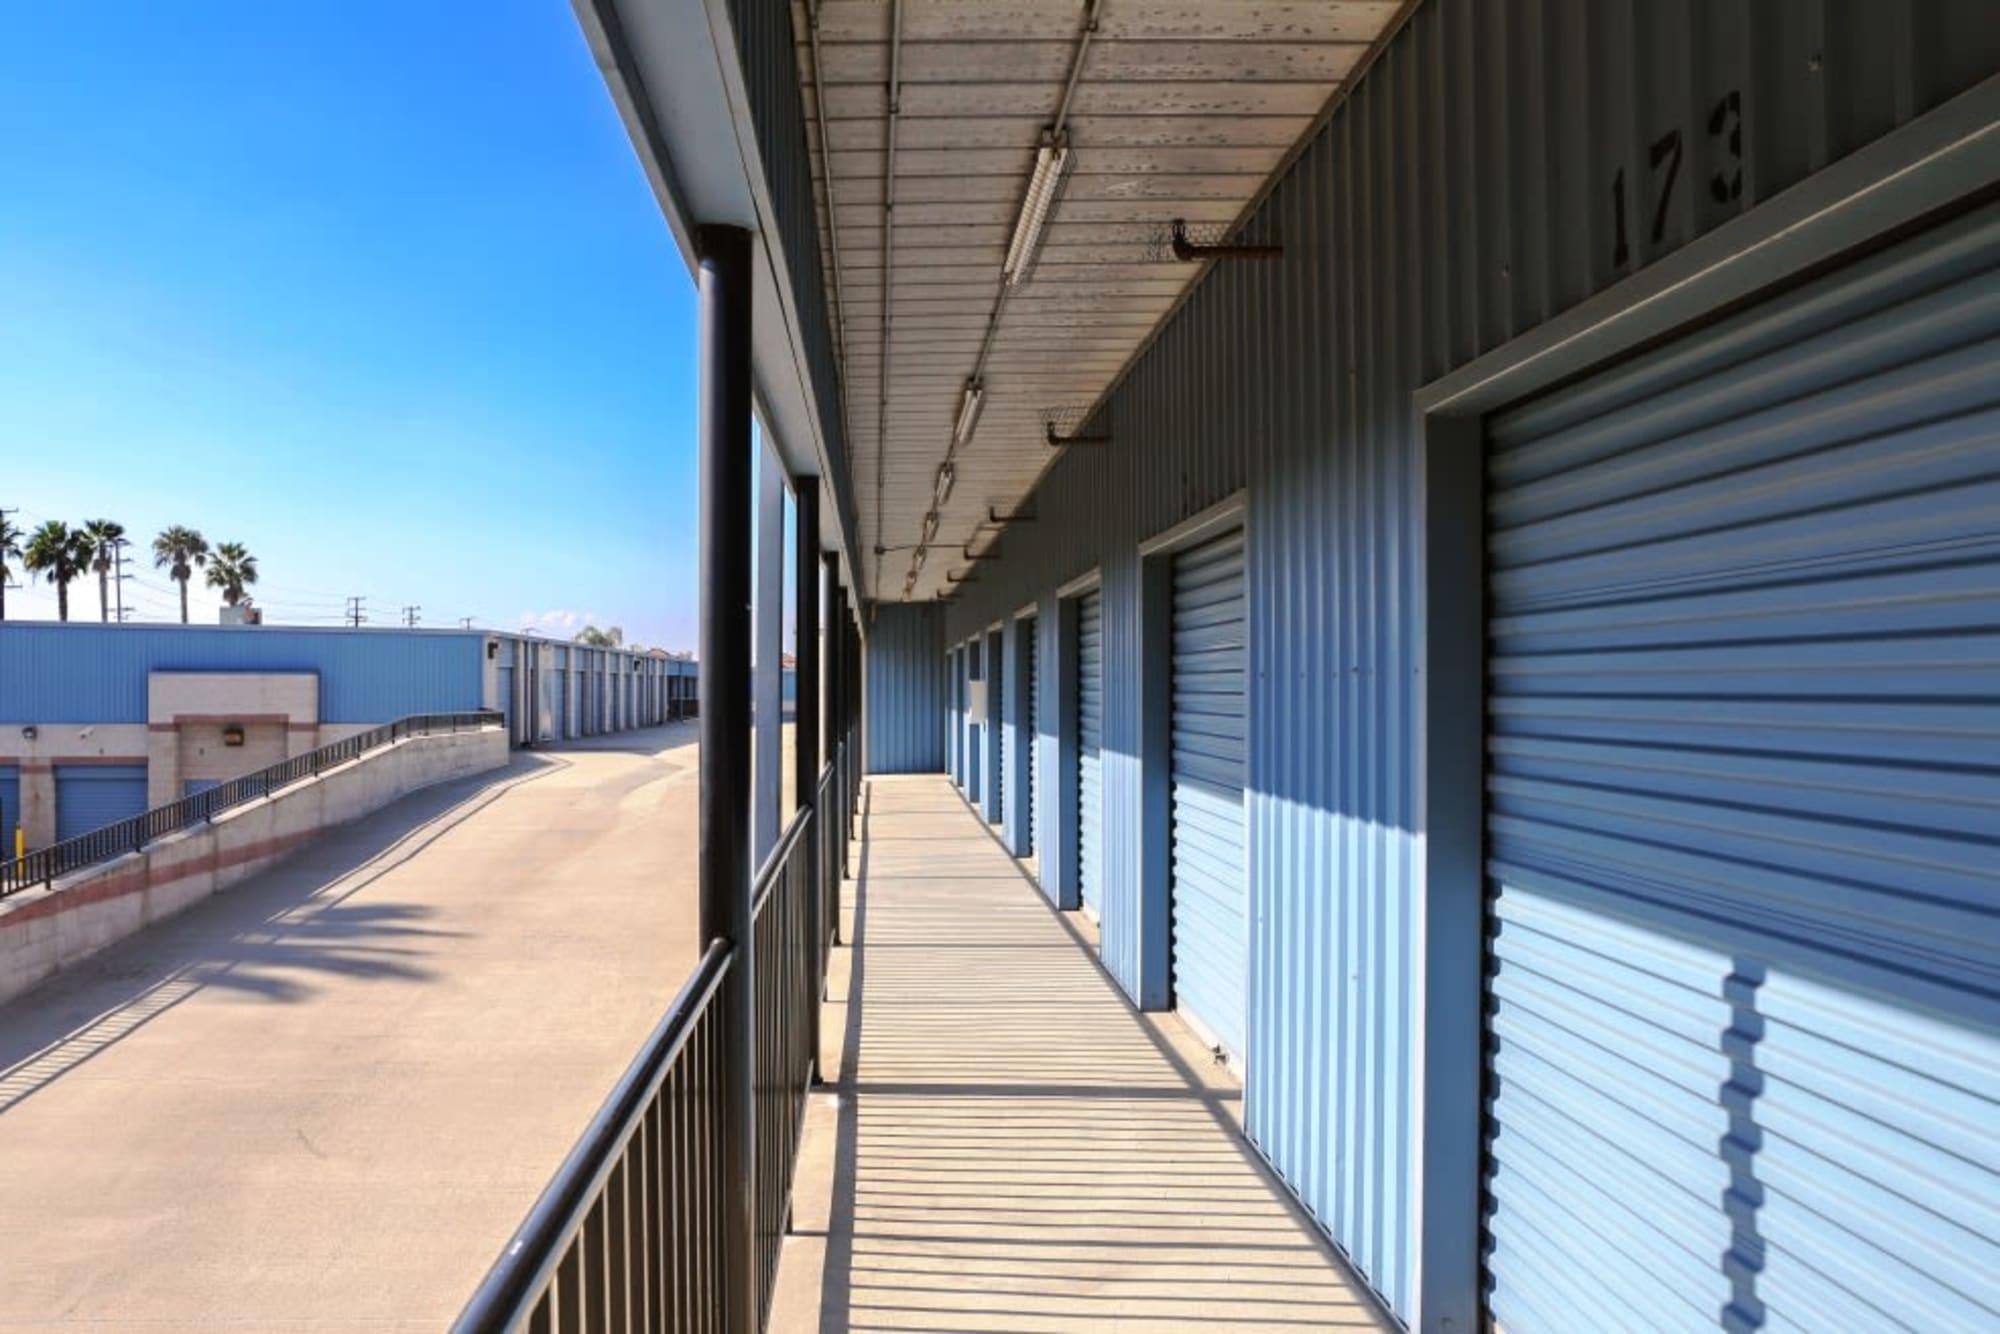 Secure storage units at A-1 Self Storage in Anaheim, California